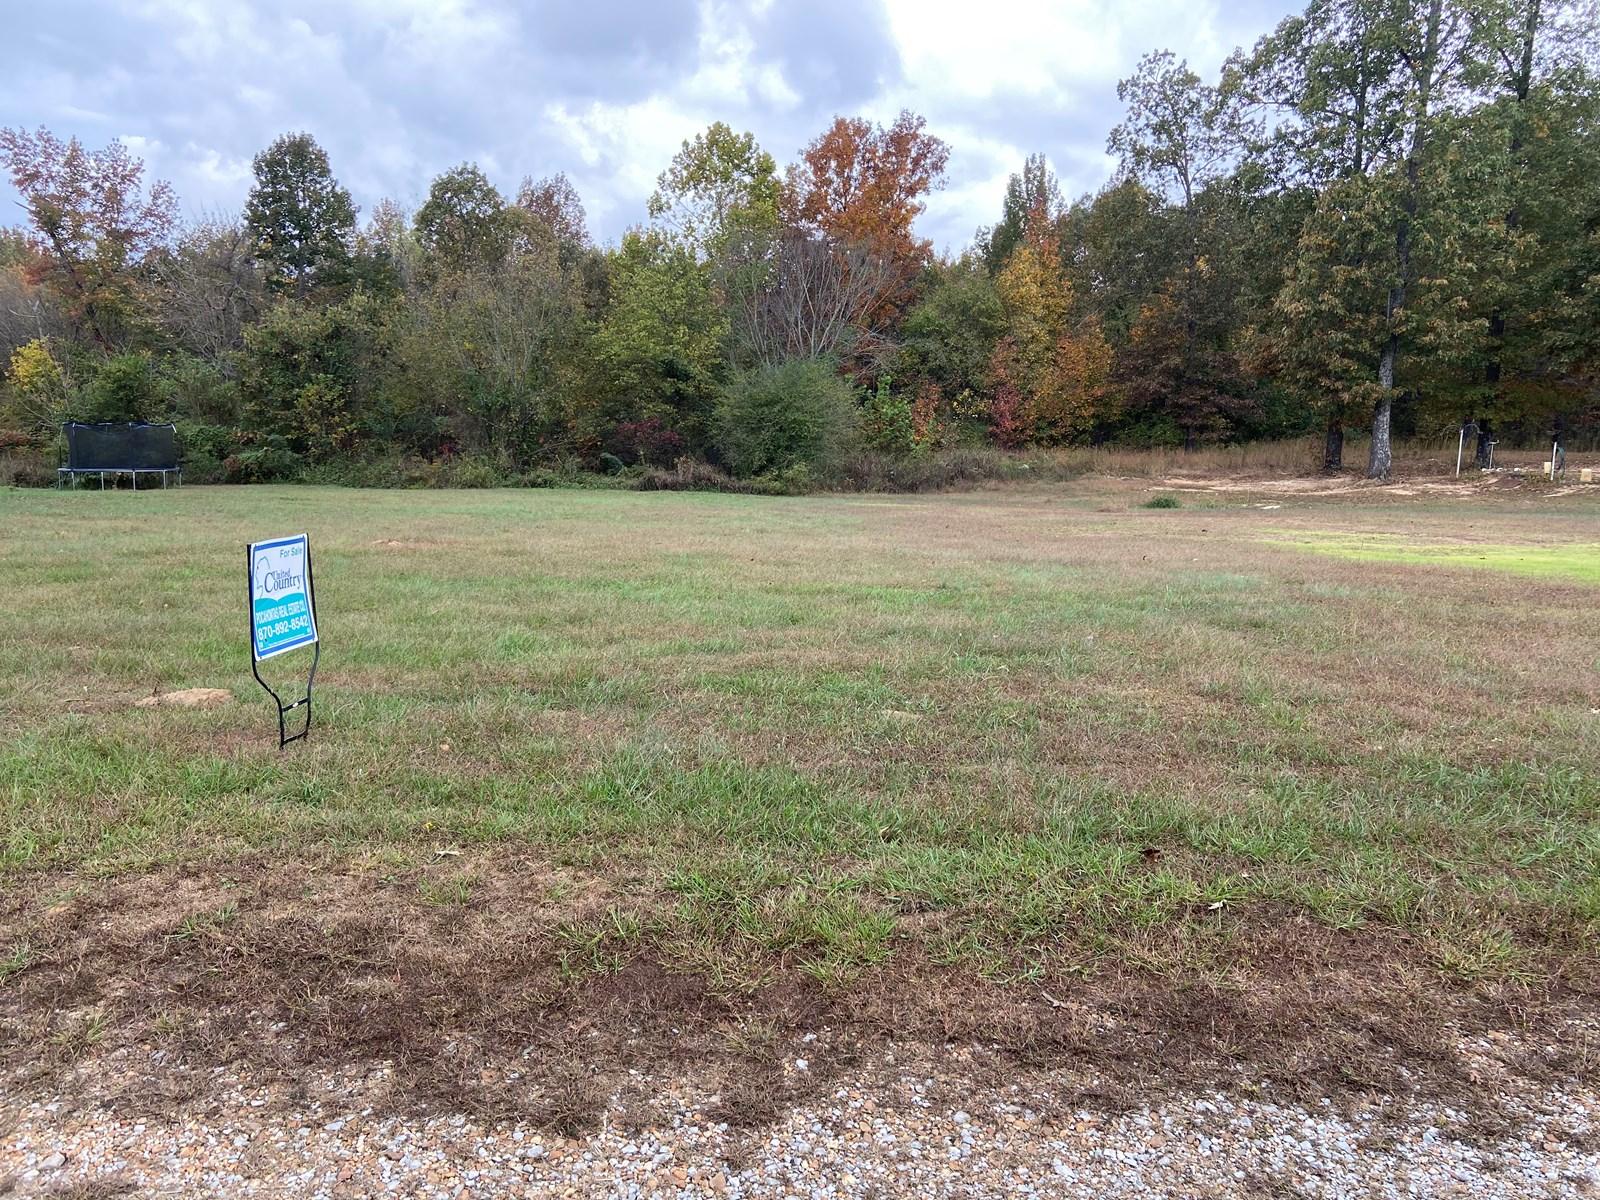 Arkansas land for sale 1 acre, Hwy frontage, Building site